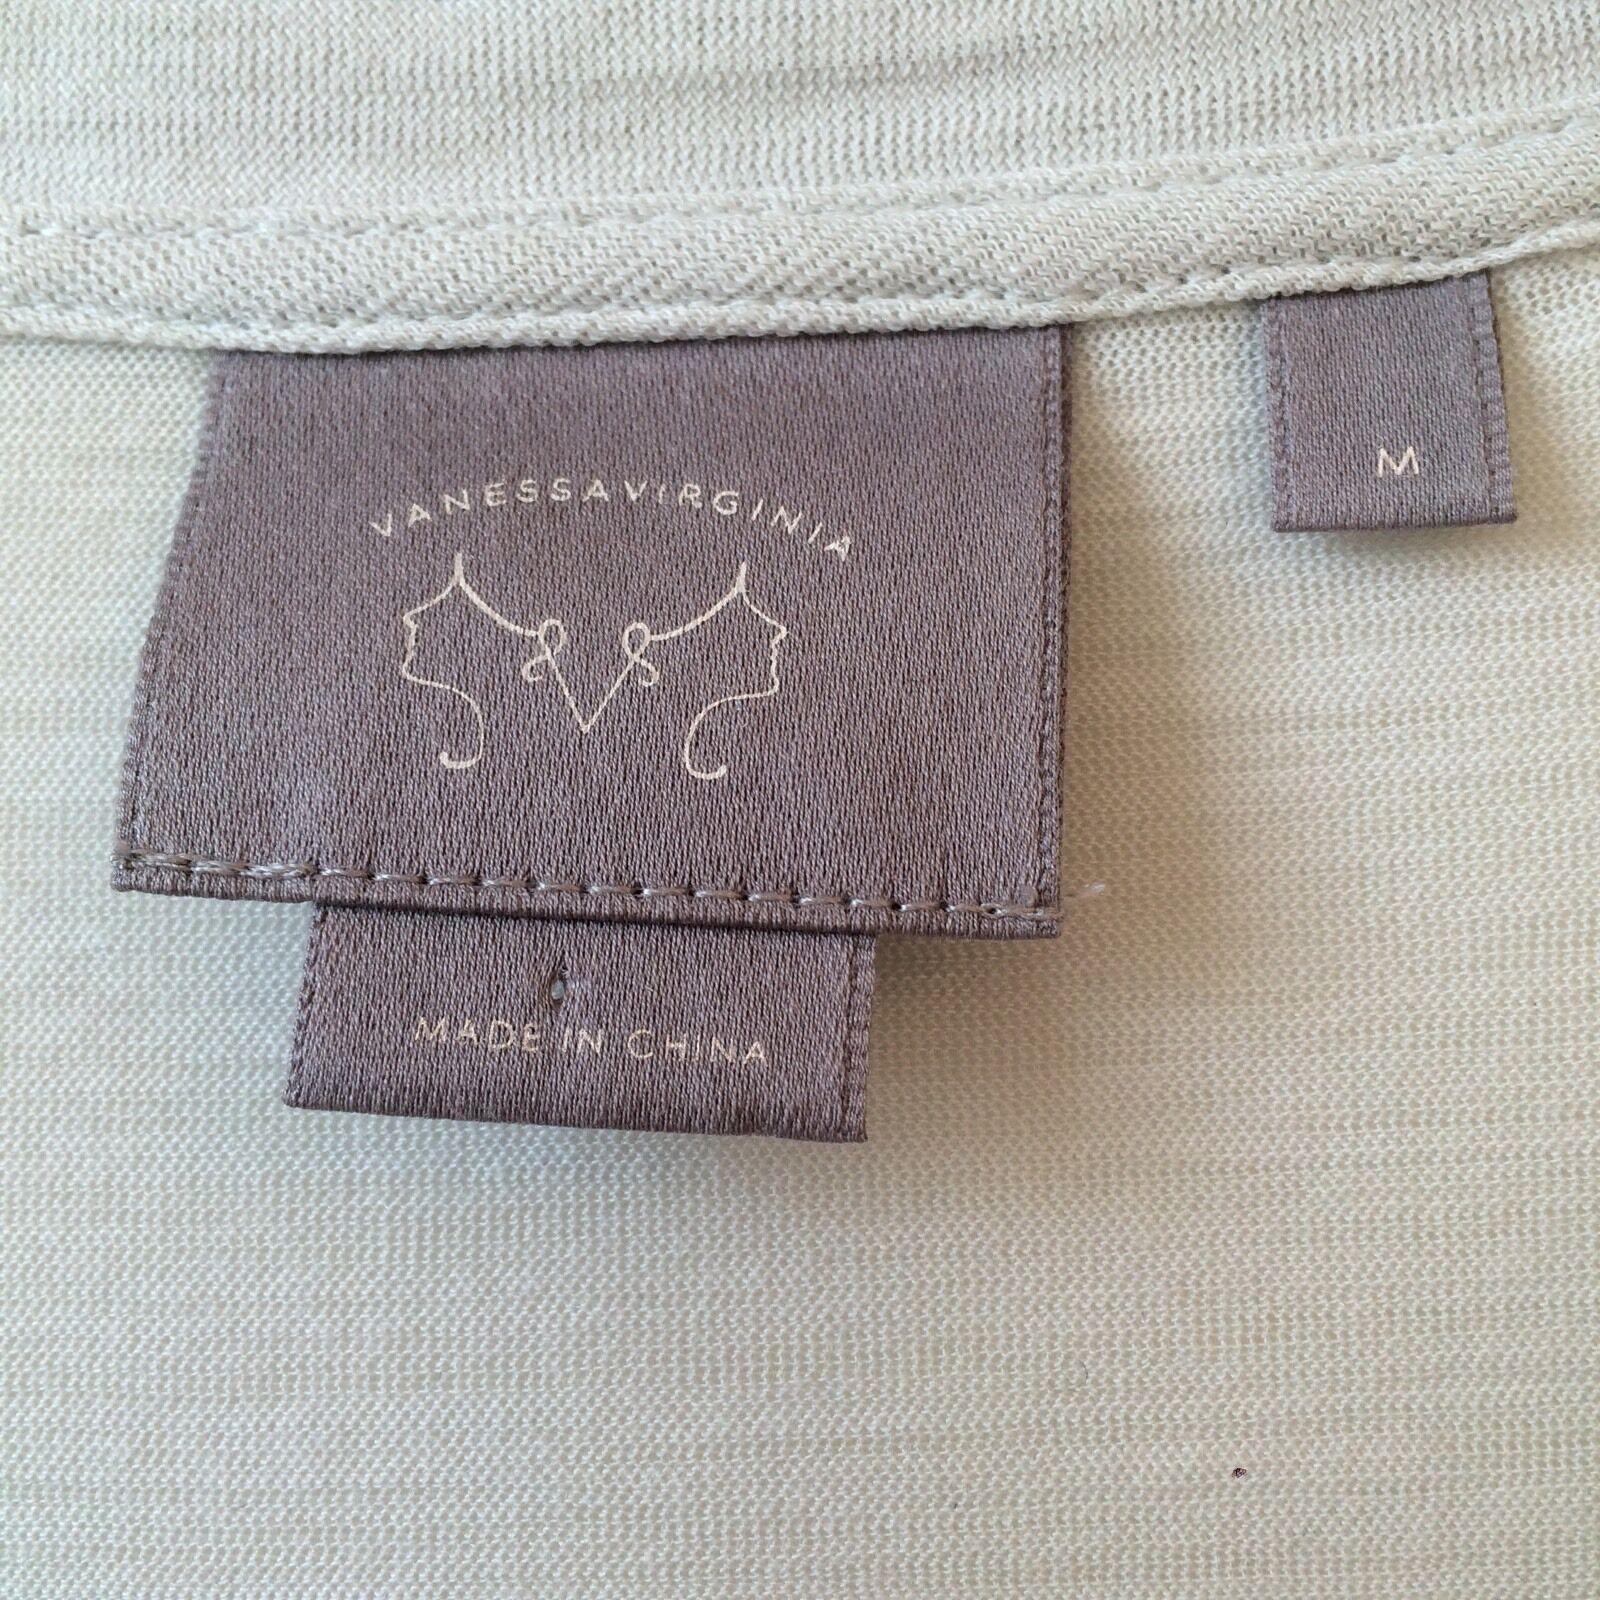 Better Bodies pantaloni corti ROUGH Sweatshorts - DARK CAMO - Sweatshorts S 0550fc